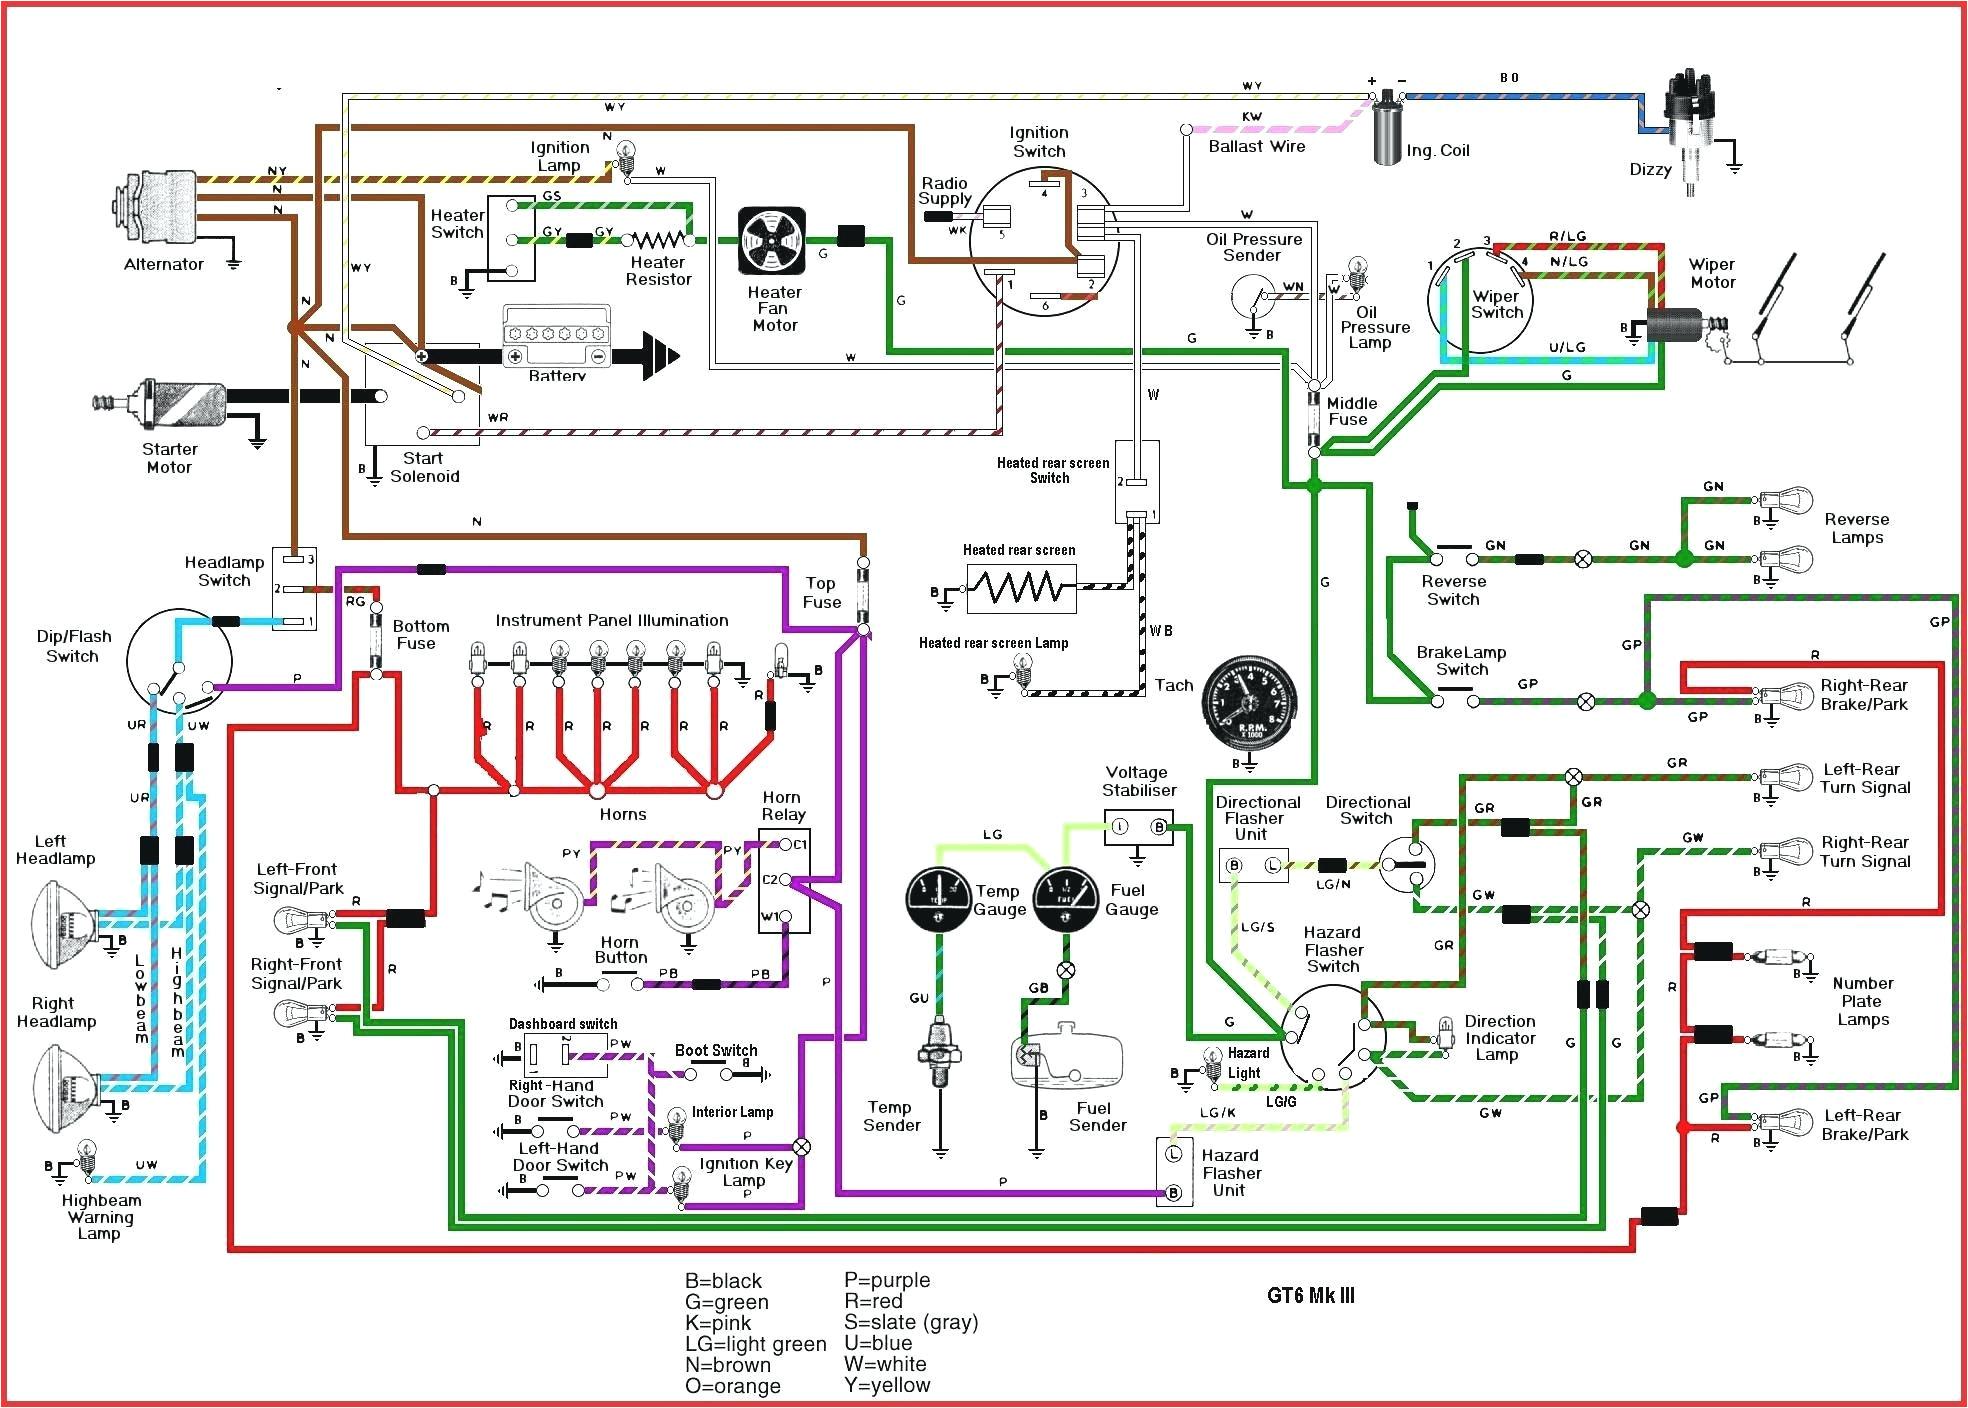 wiring diagram house electrical plansic home pdf new simplifiedics fantastic jpg